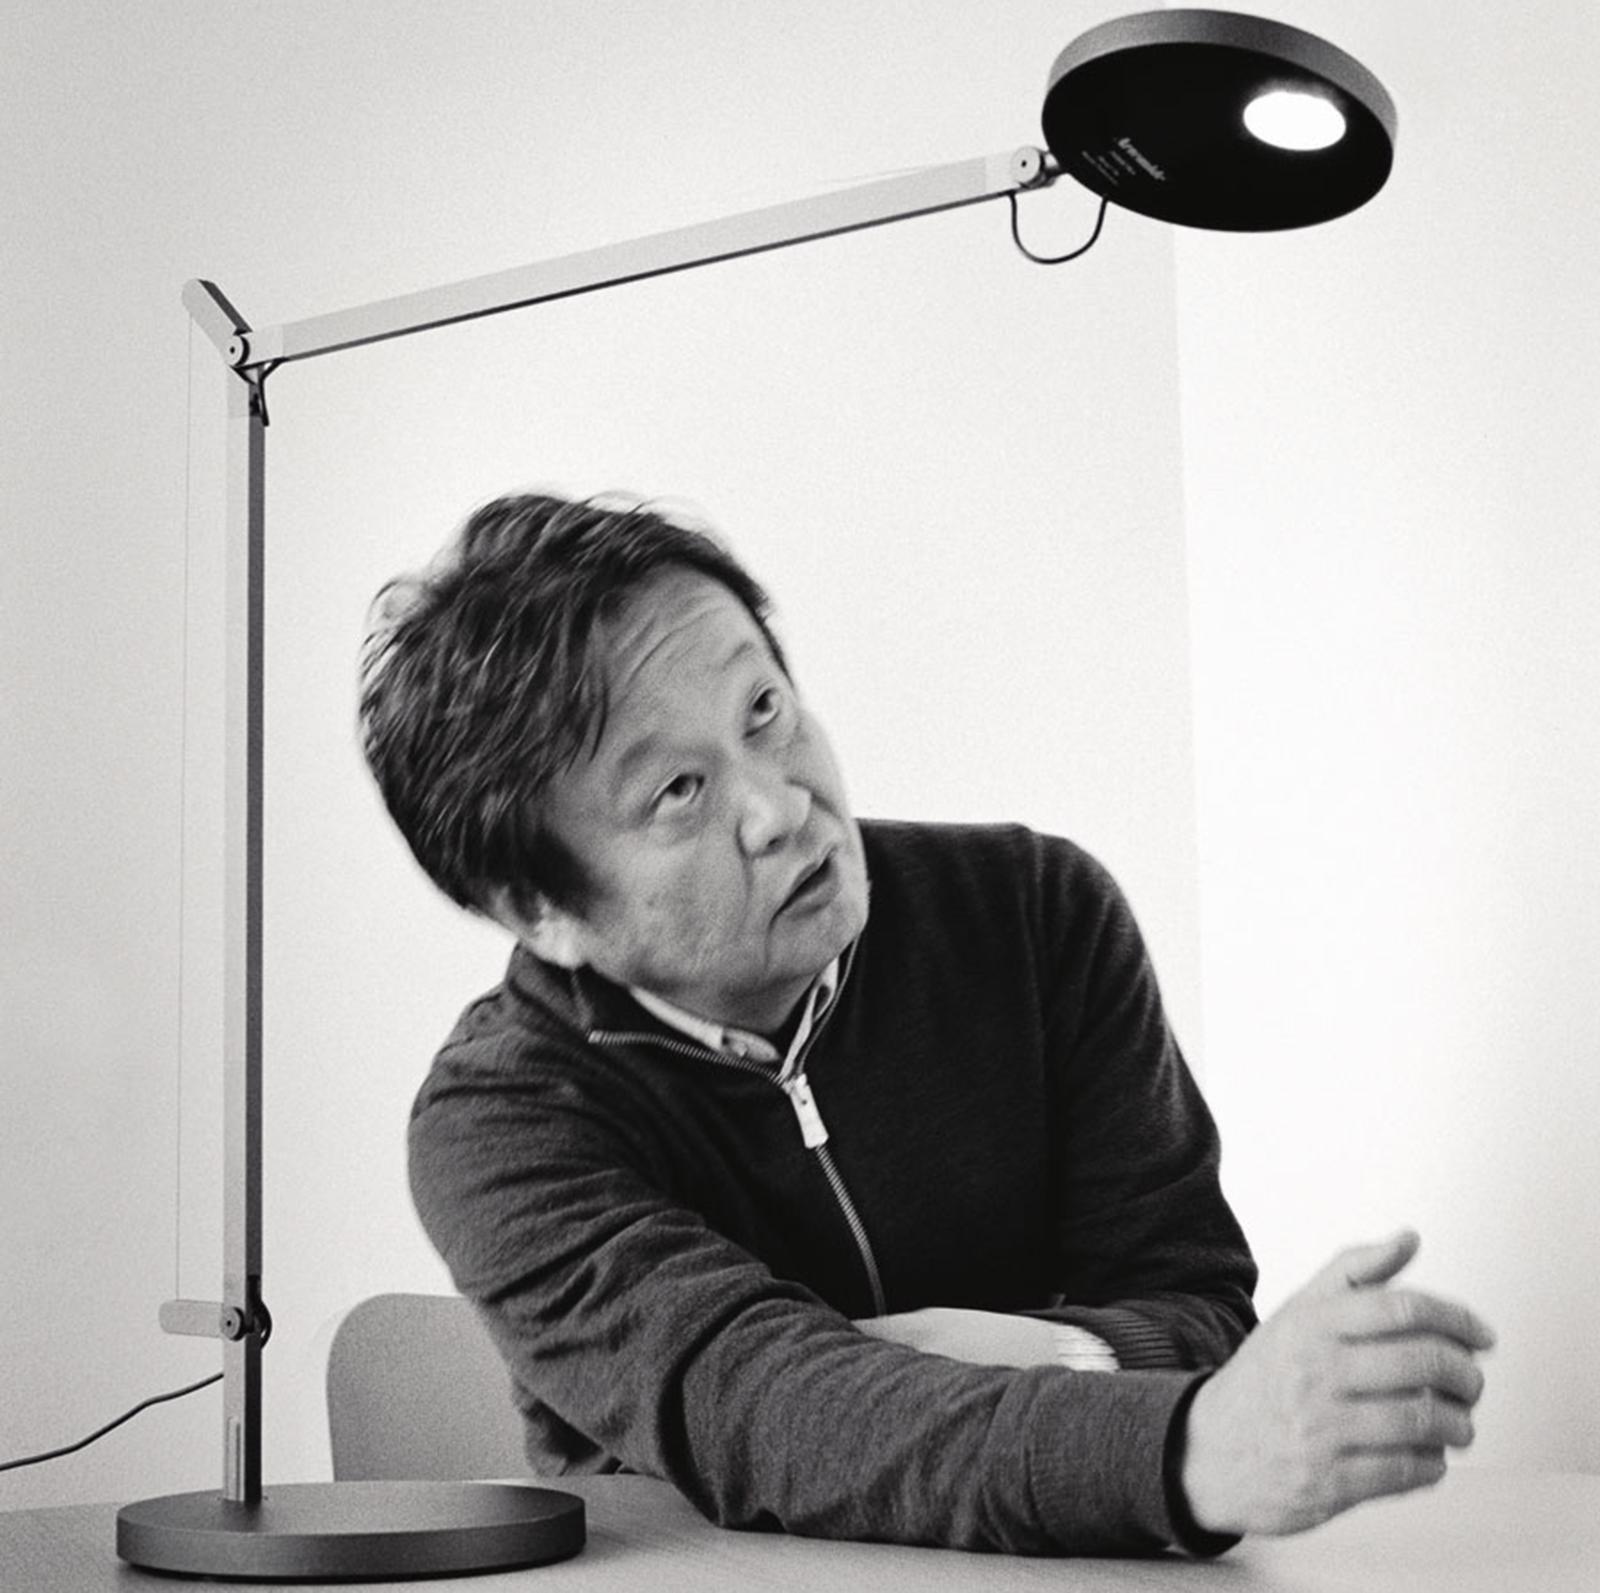 Designapplause Demetra Naoto Fukasawa